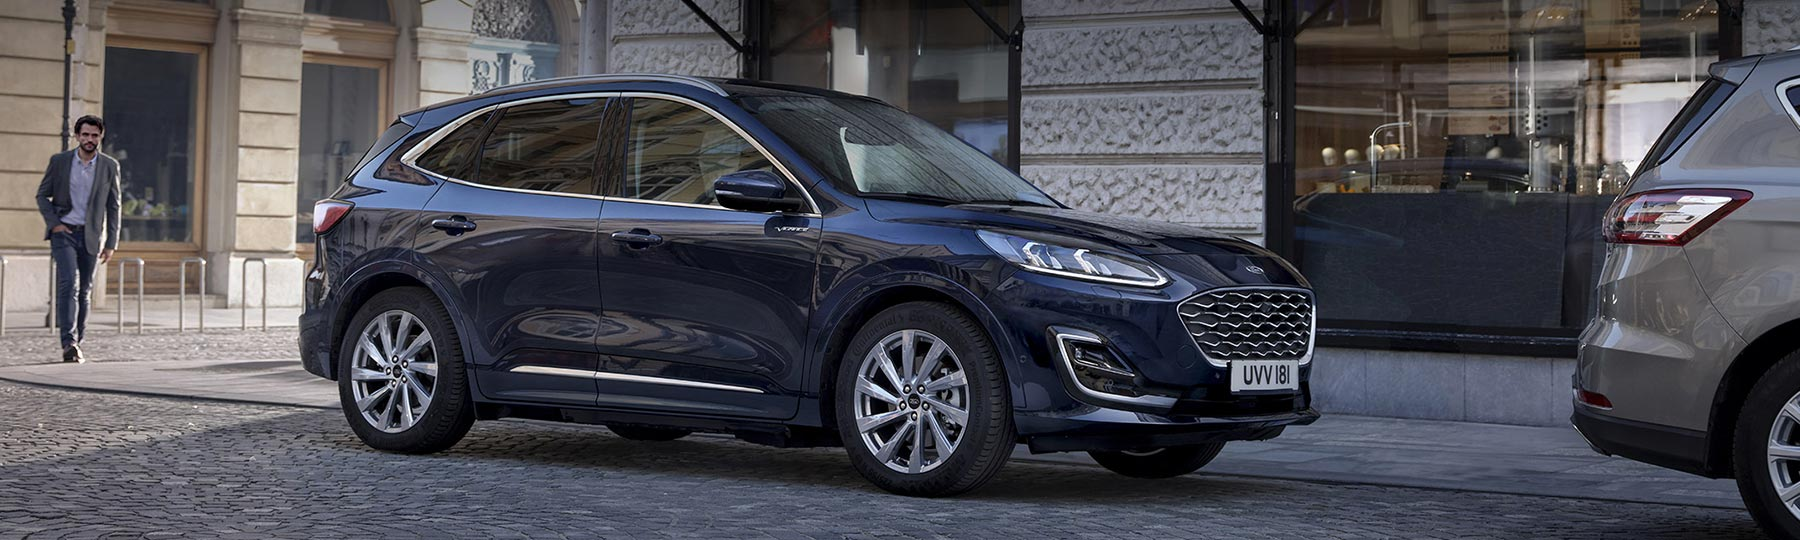 Ford Kuga New Car Offer